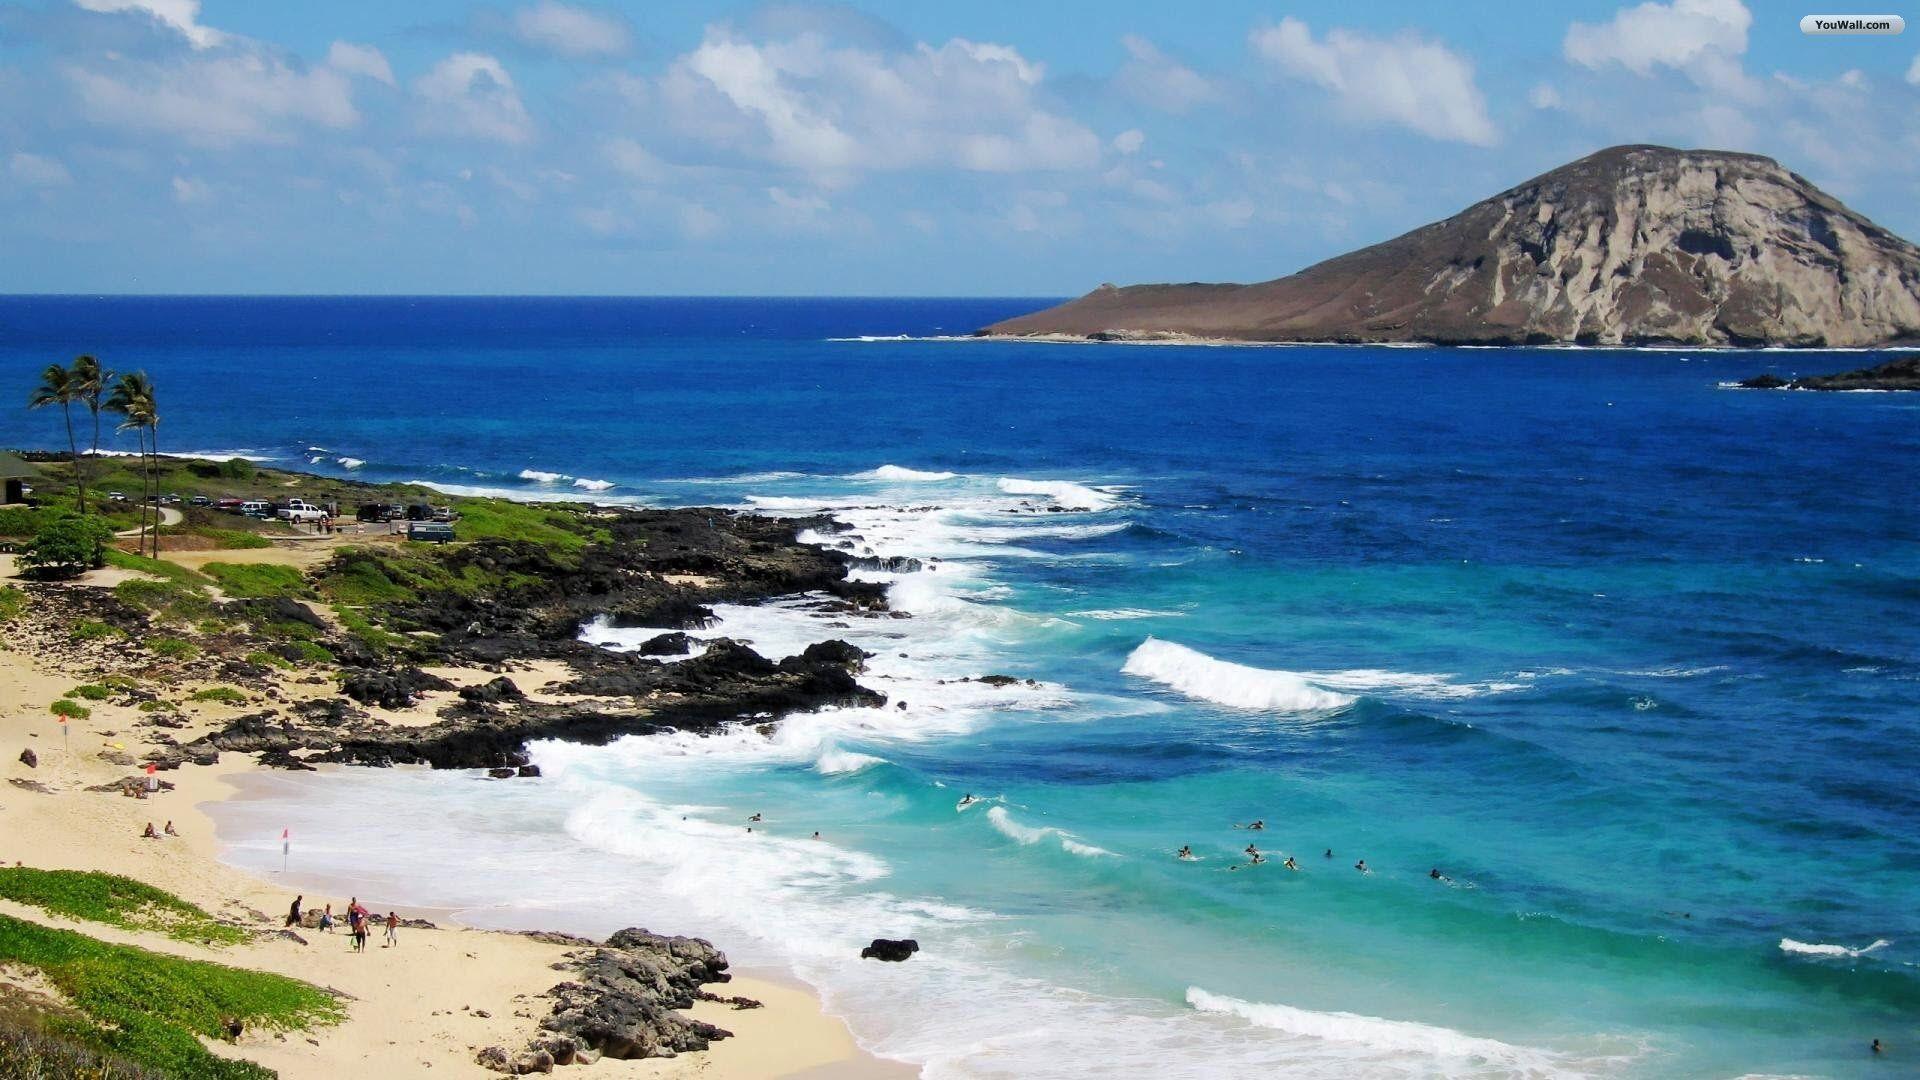 Res: 1920x1080, Beaches at North-Eastern Oahu Shore, Makapu'u Beach Park, Hawaii